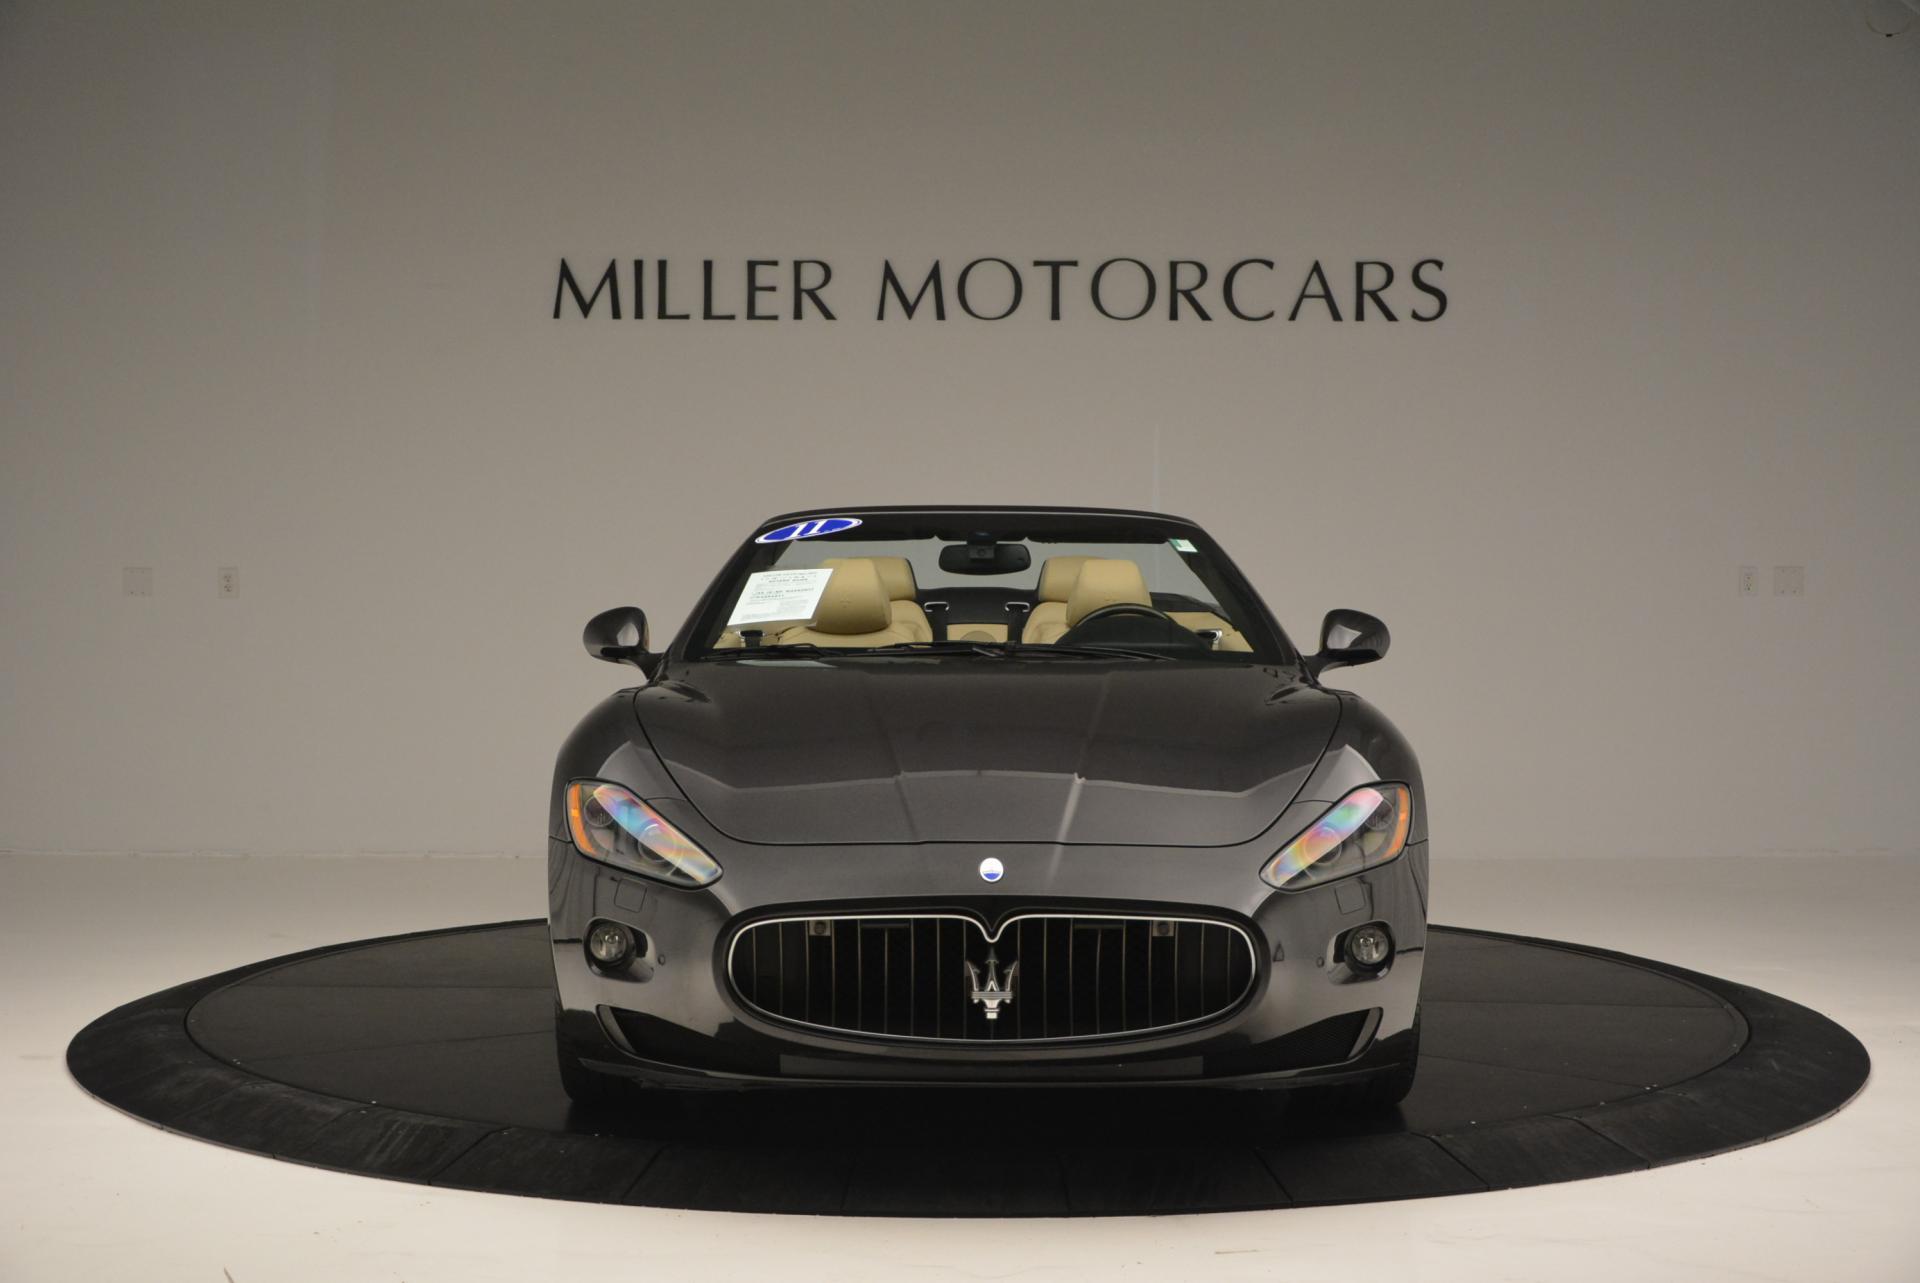 Used 2011 Maserati GranTurismo Base For Sale In Westport, CT 158_p12